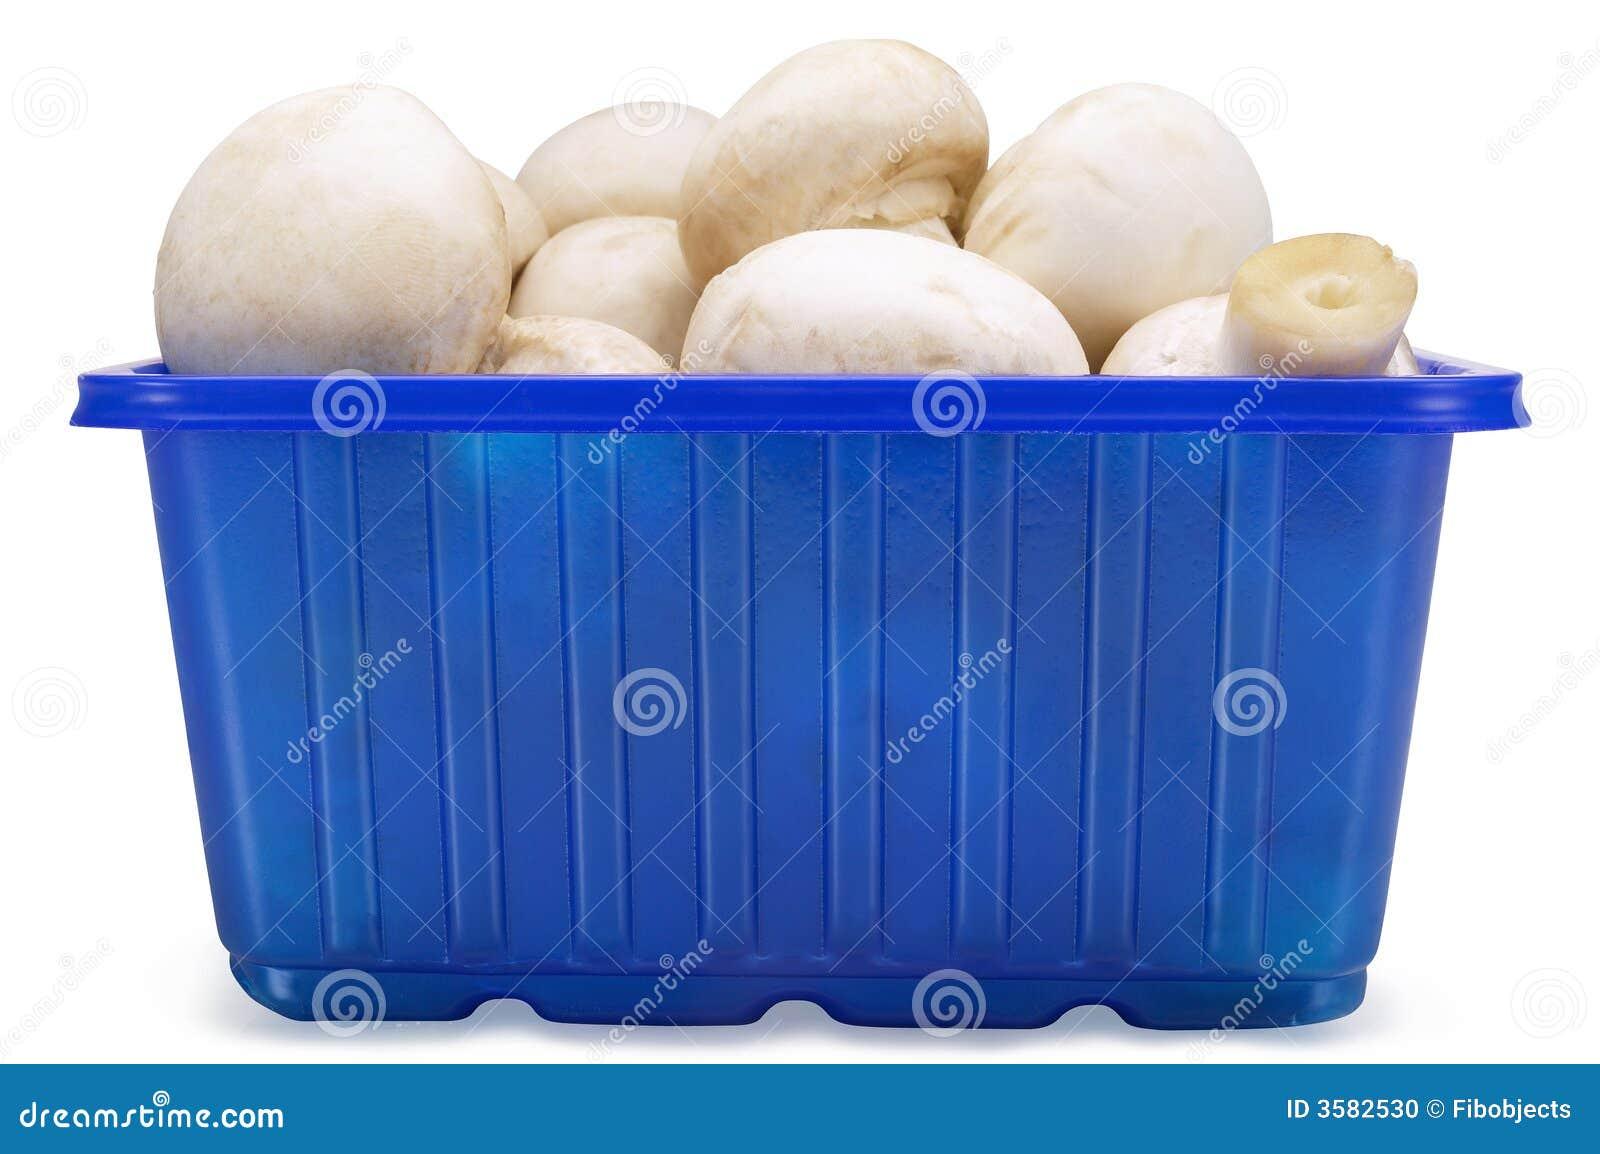 Funghi in una casella